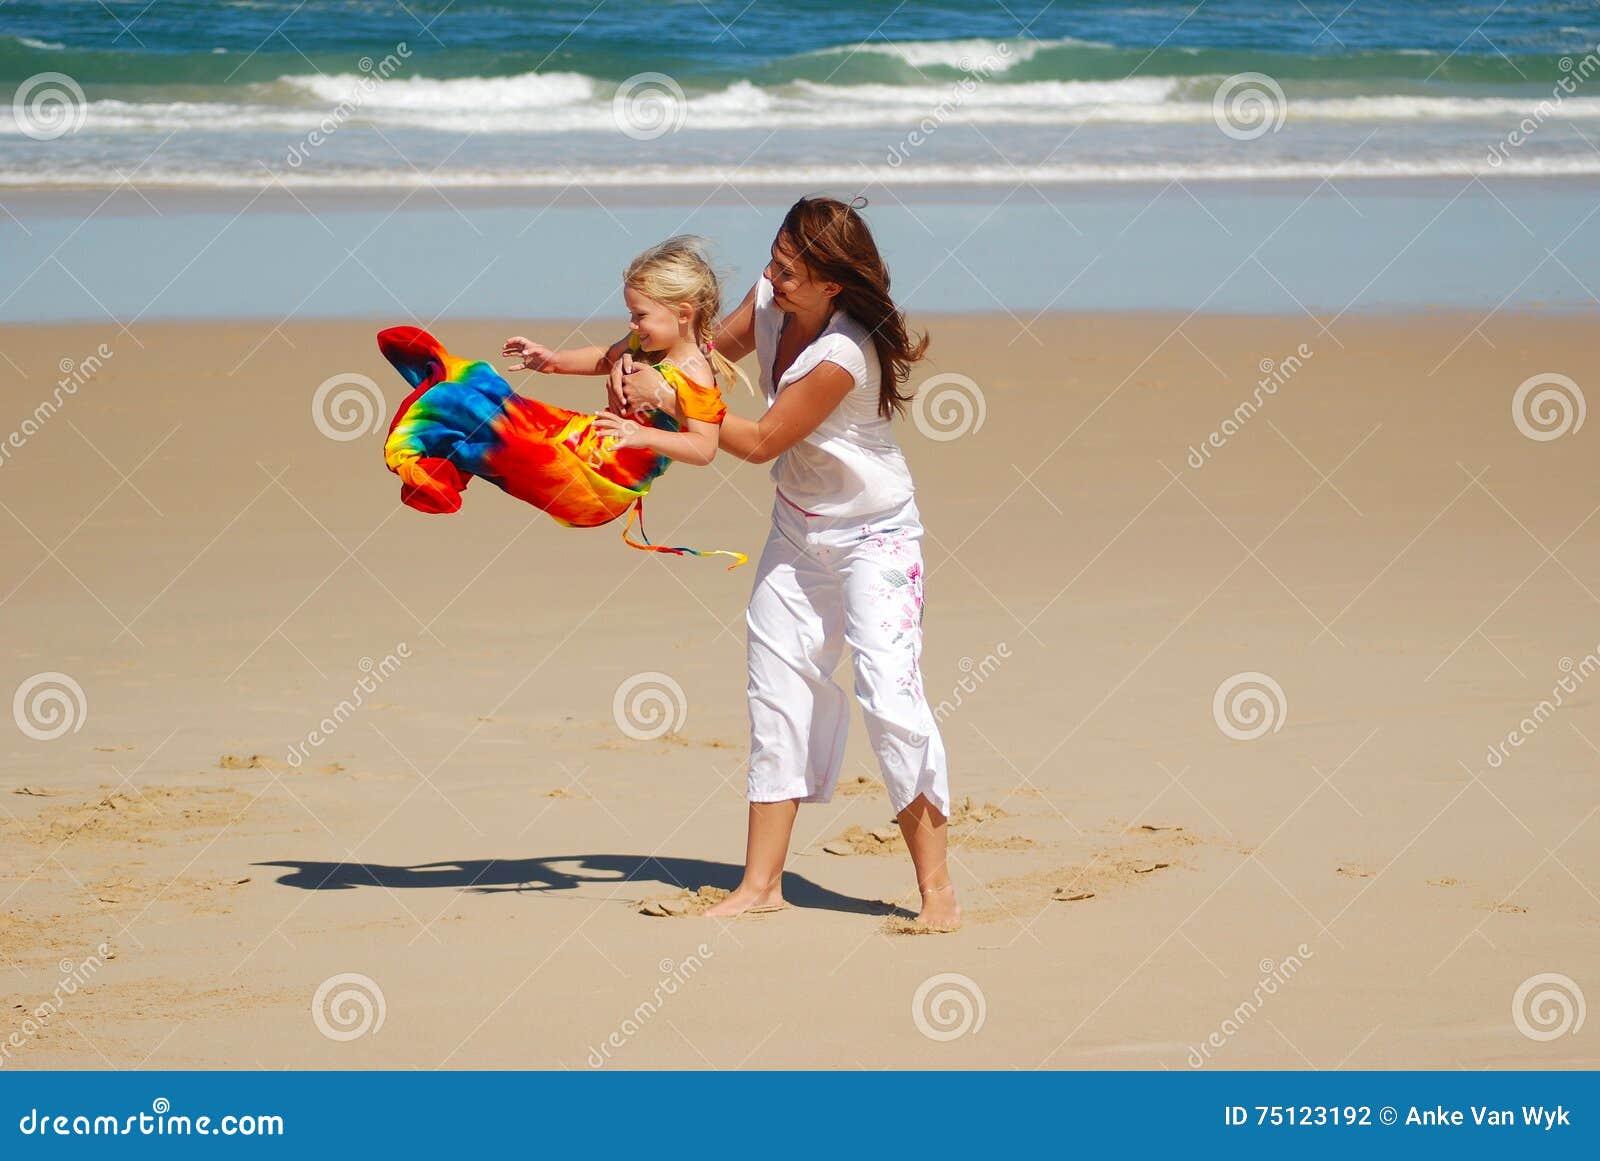 Beach fun with mom